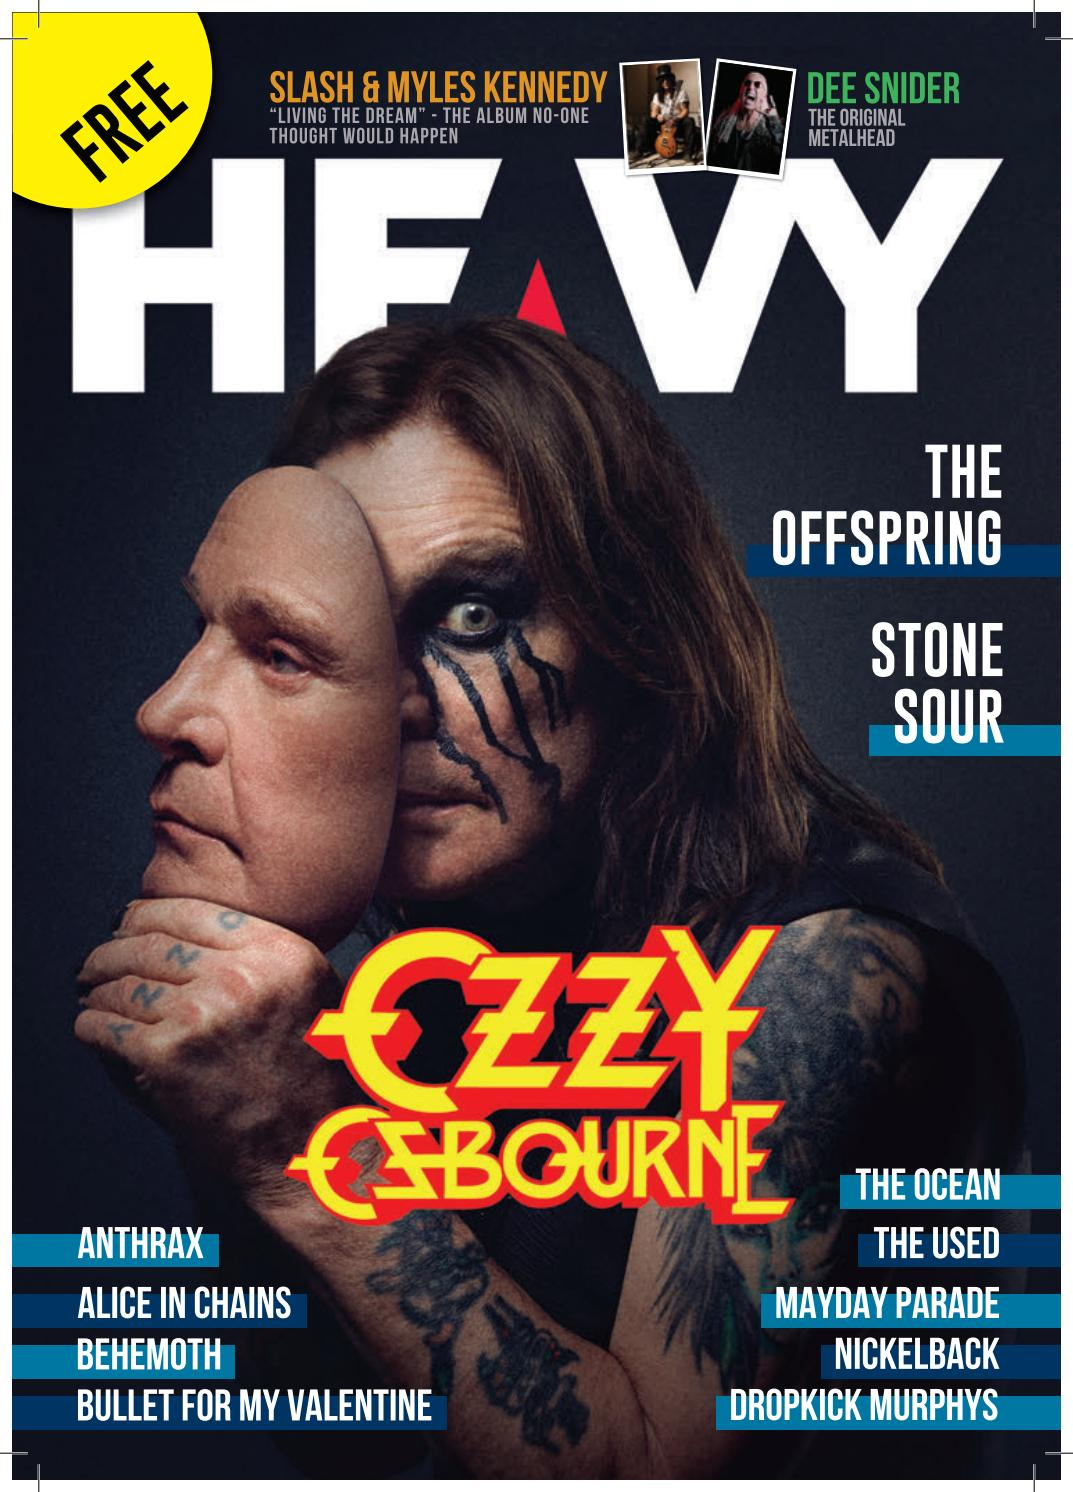 HEAVY Music Magazine - Issue #65 - November 2018 by HEAVY Music